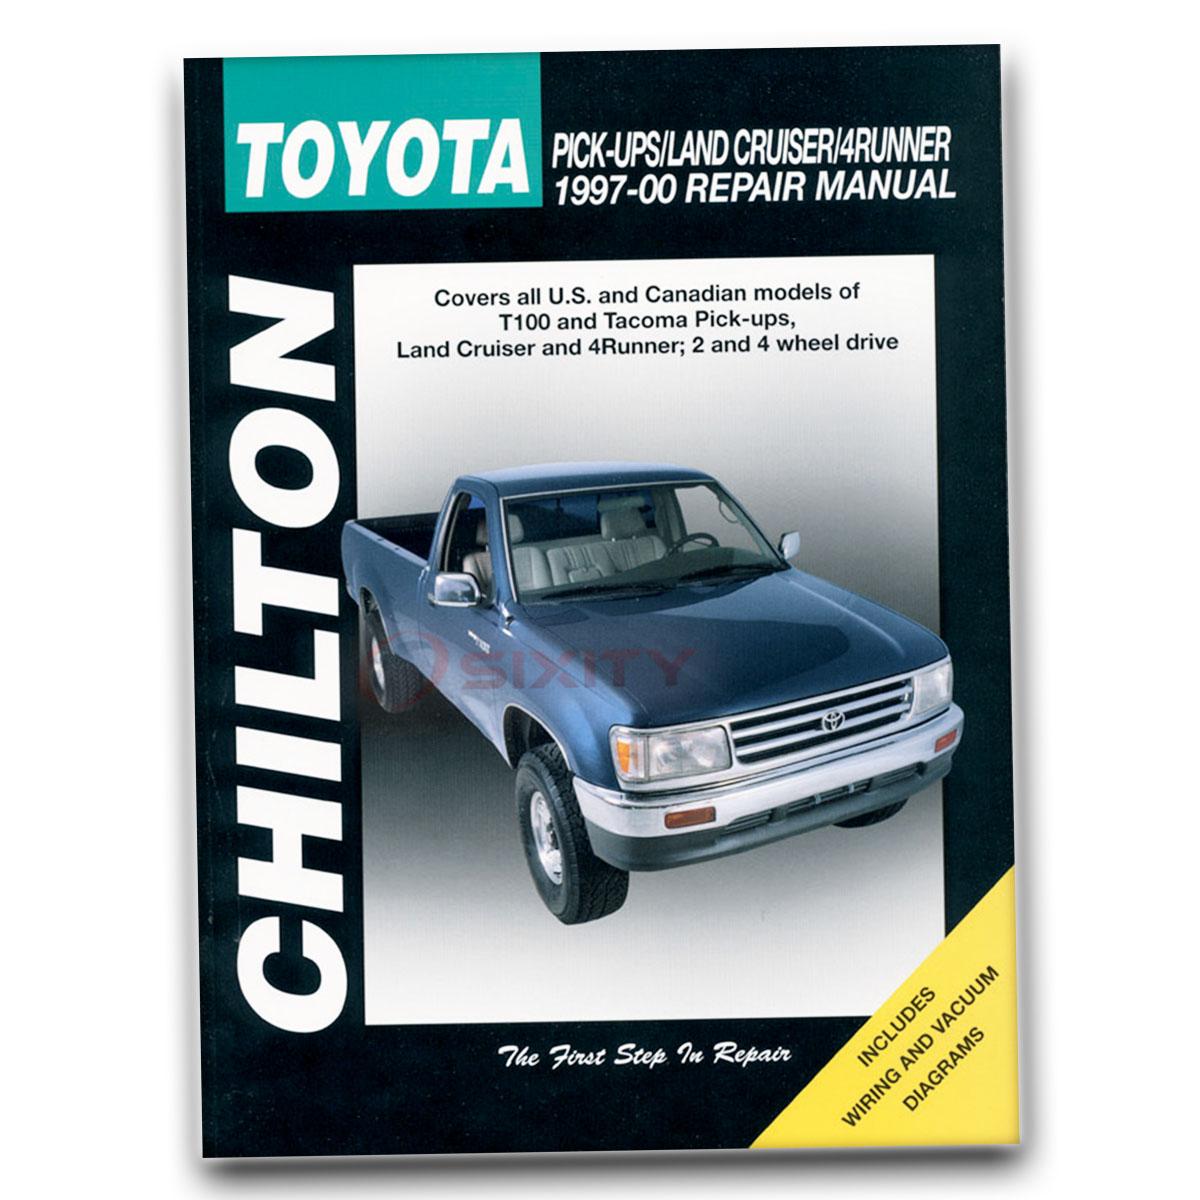 toyota 4runner chilton repair manual sr5 limited base shop service rh ebay com 1997 toyota 4runner owners manual pdf 1997 Toyota 4Runner Ideas